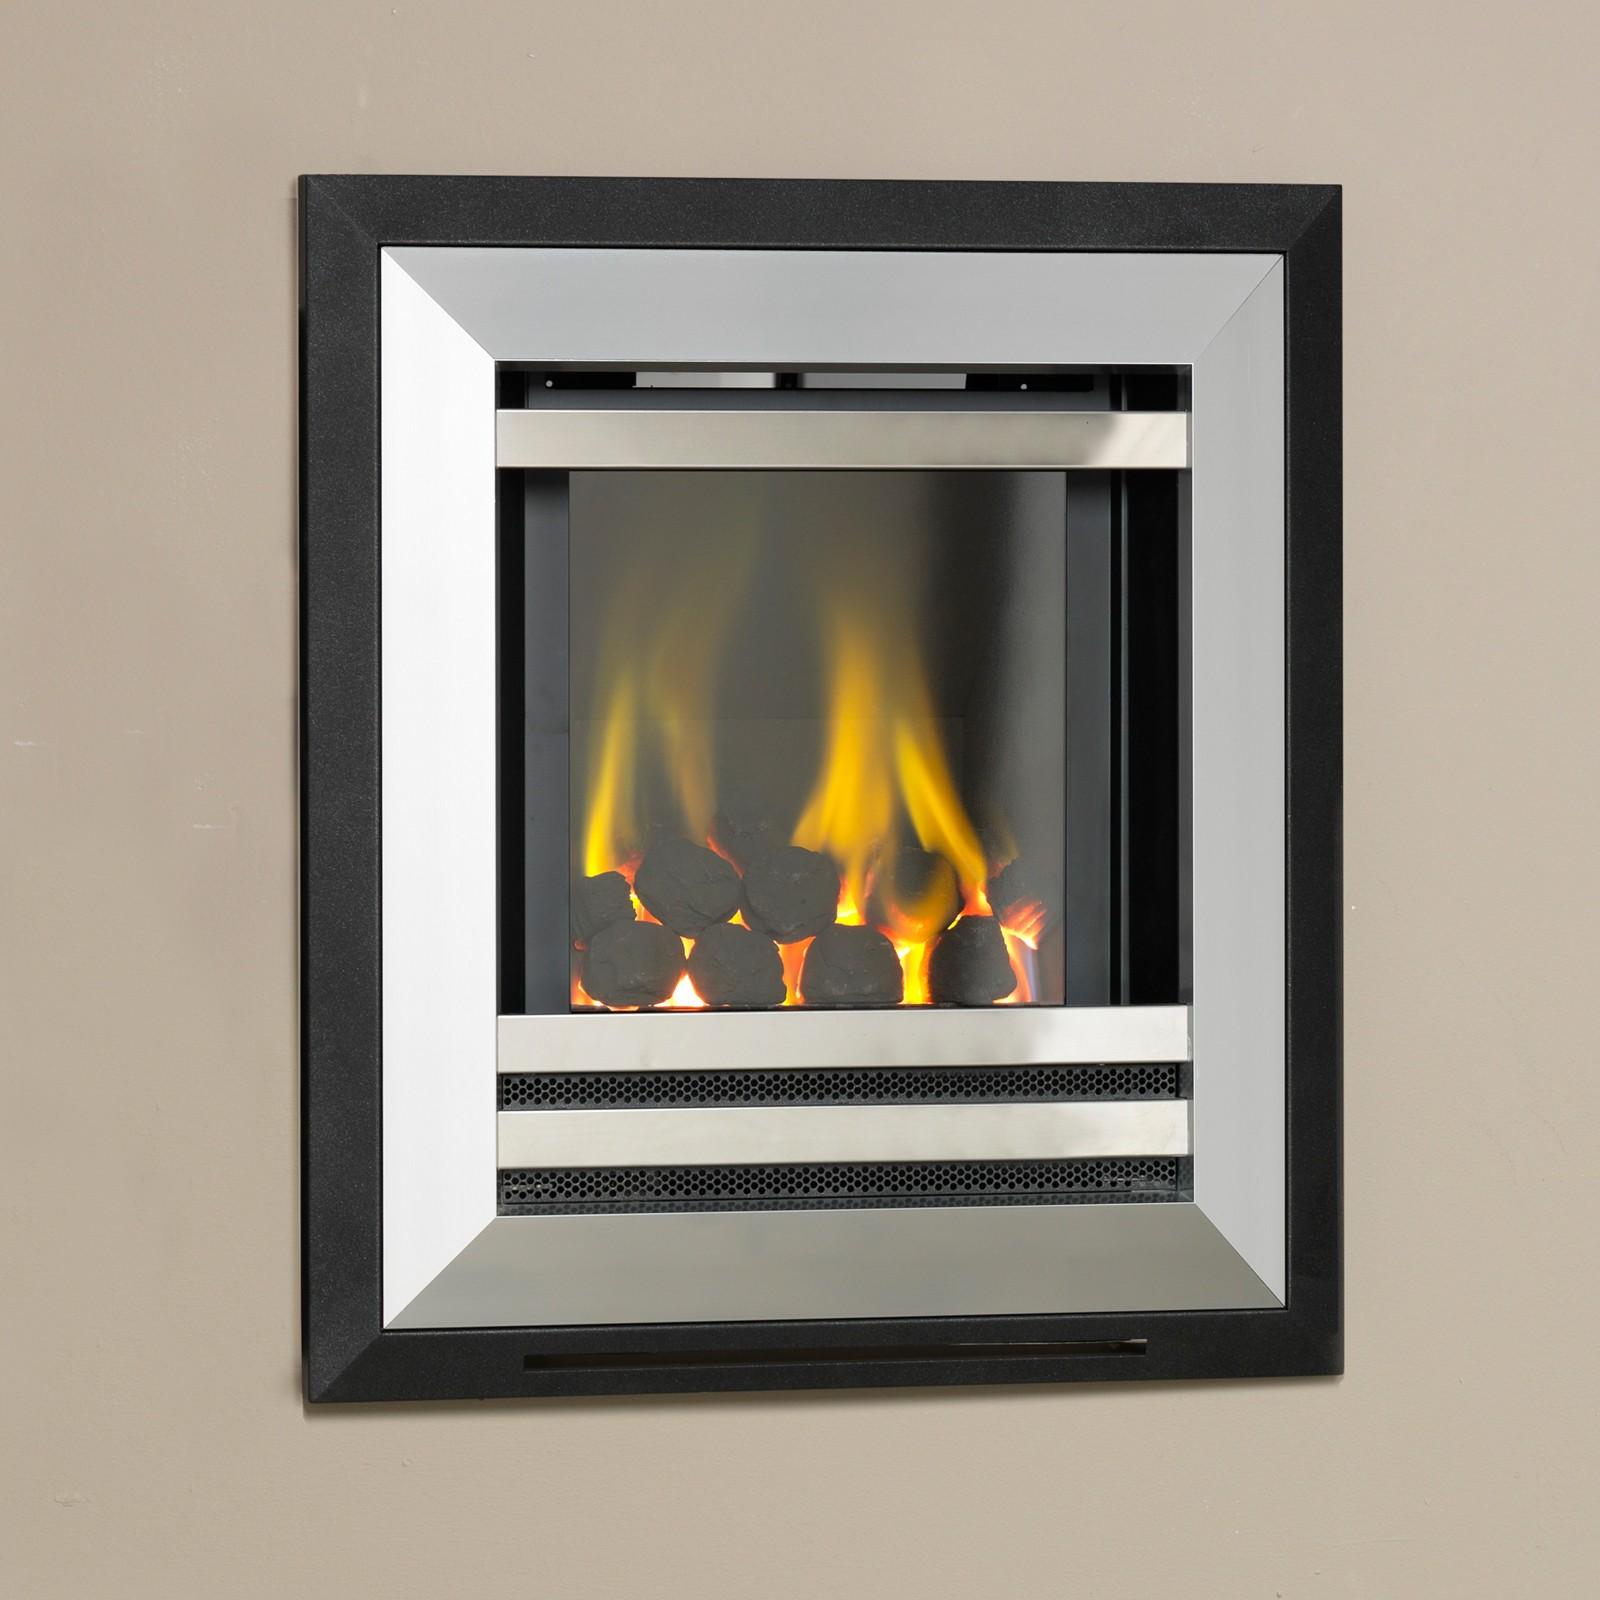 Outstanding Prices Flavel Diamond He Gas Fire Sleek Design